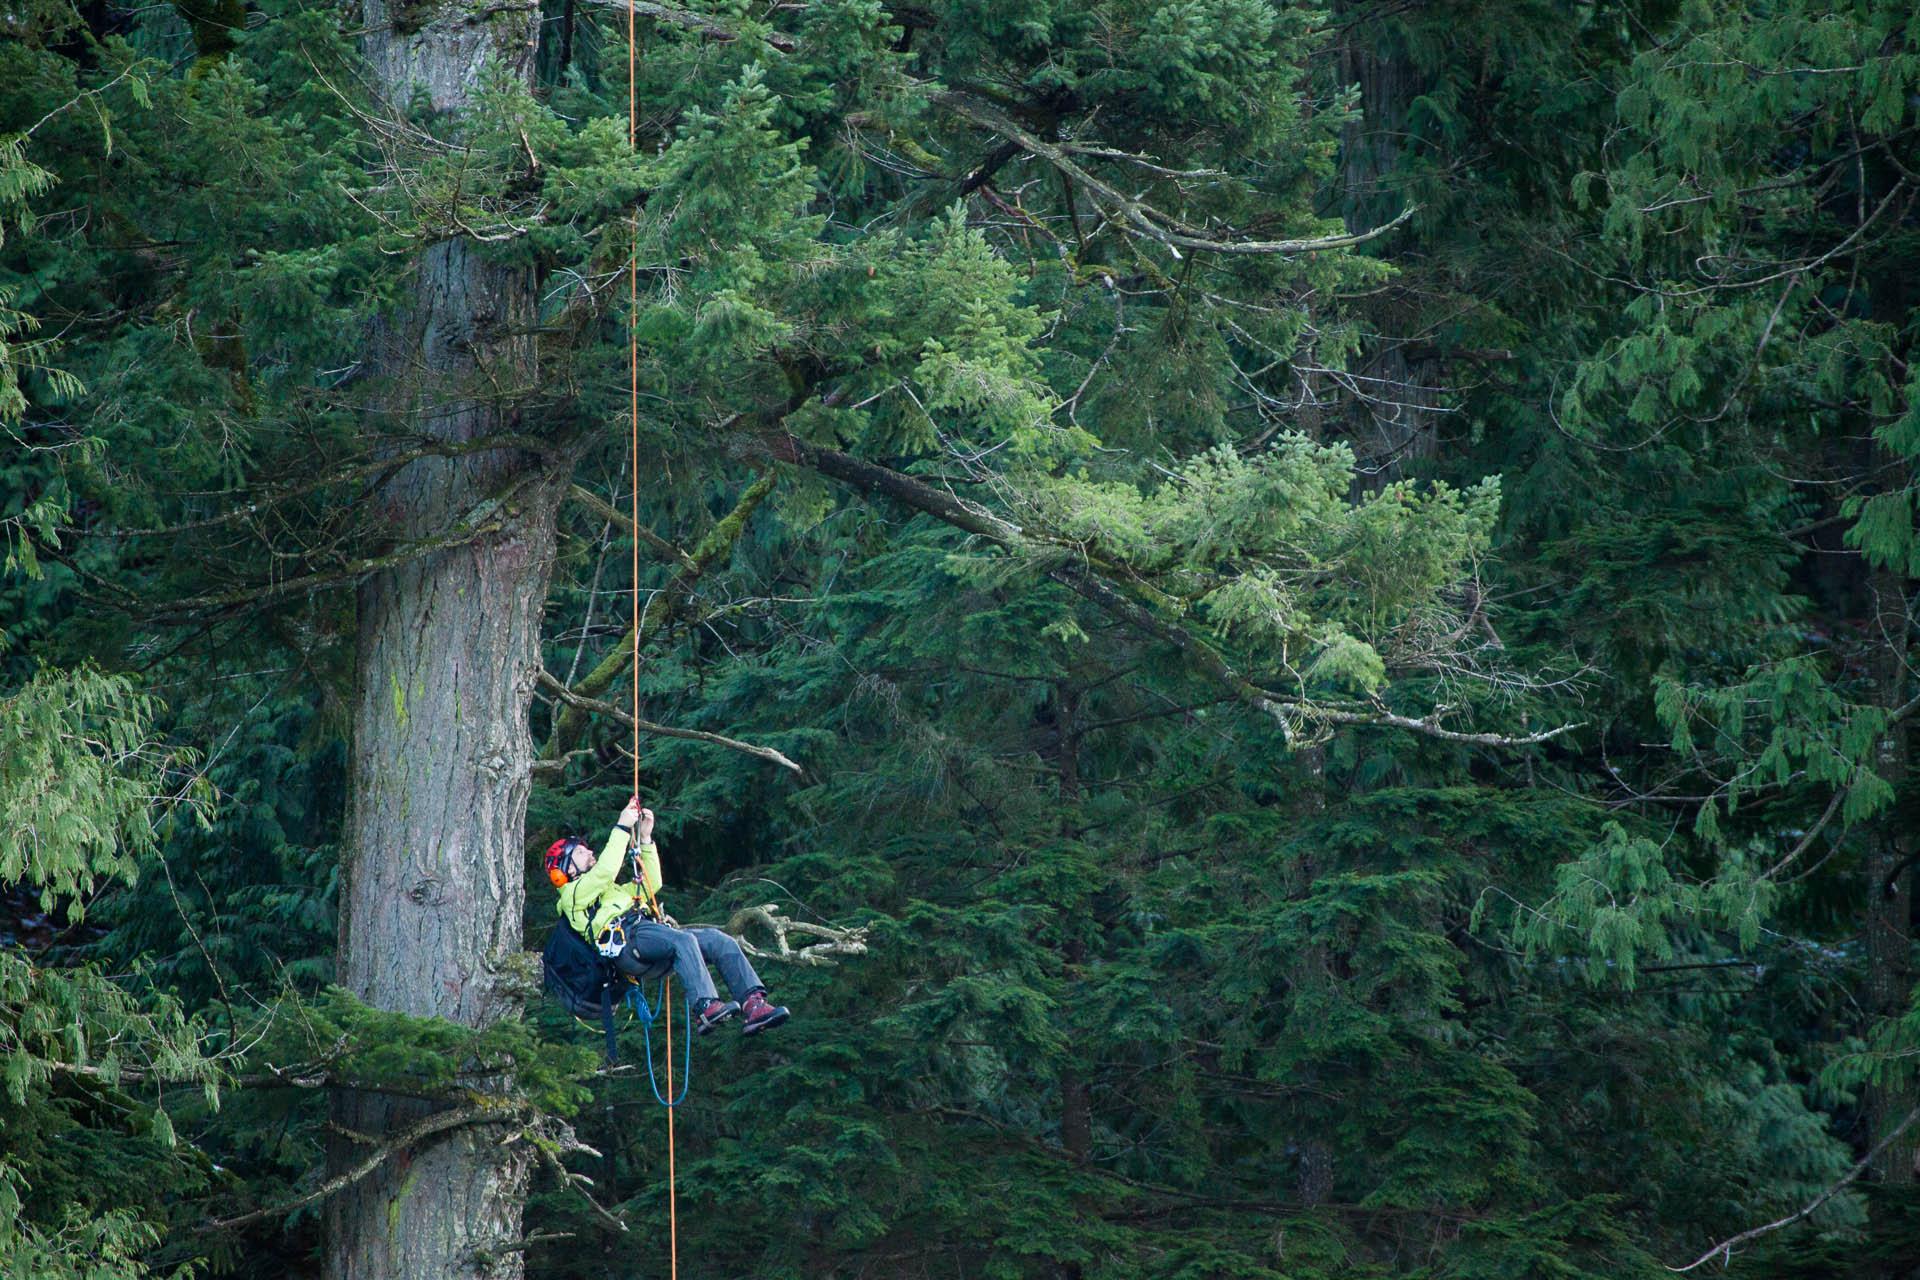 tree-climbing-at-echo-lake-3.jpg